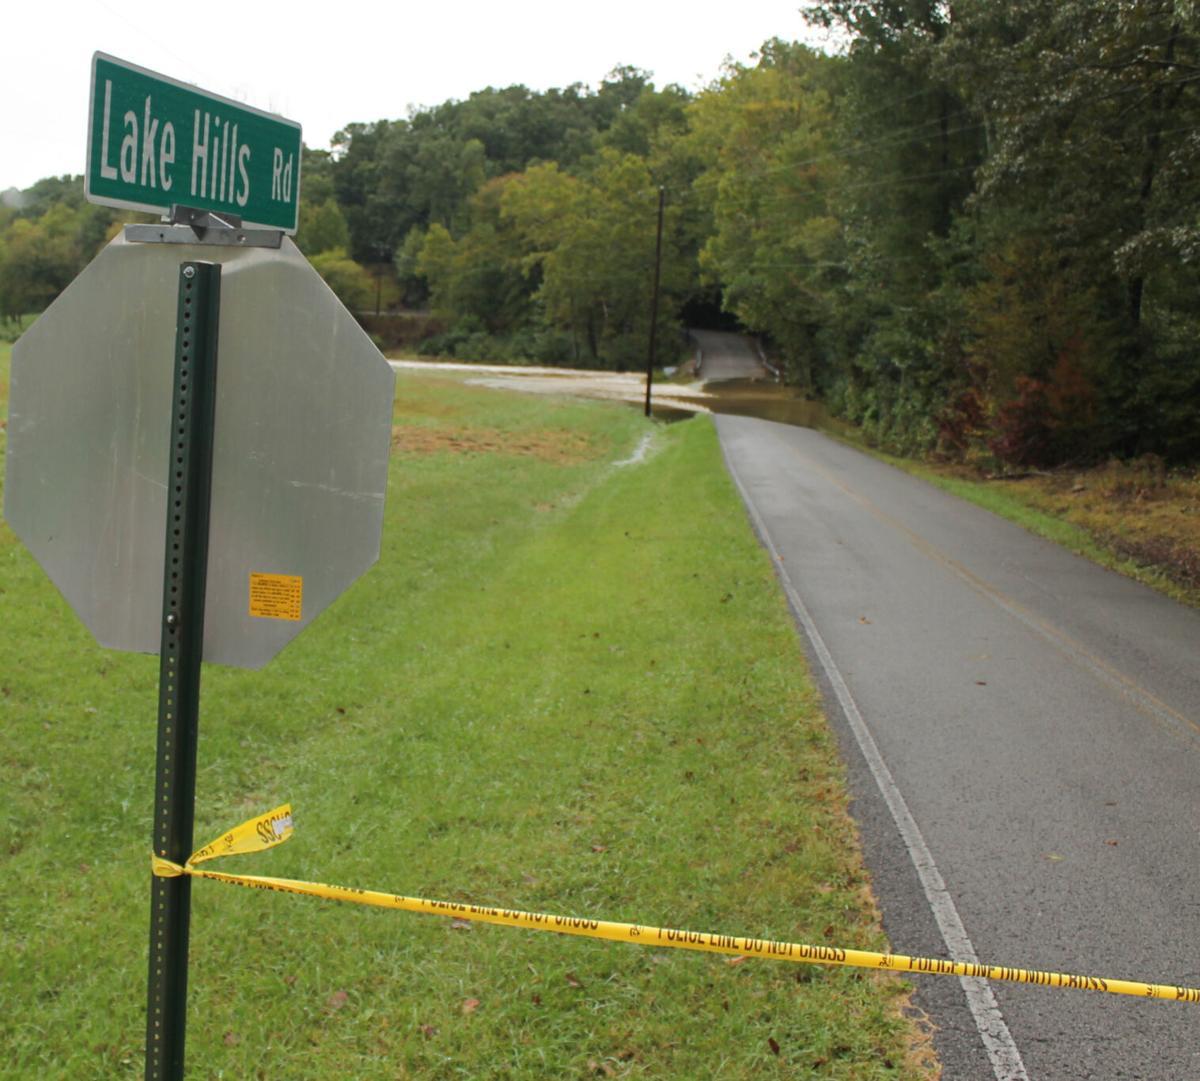 Lake Hills Rd stop sign